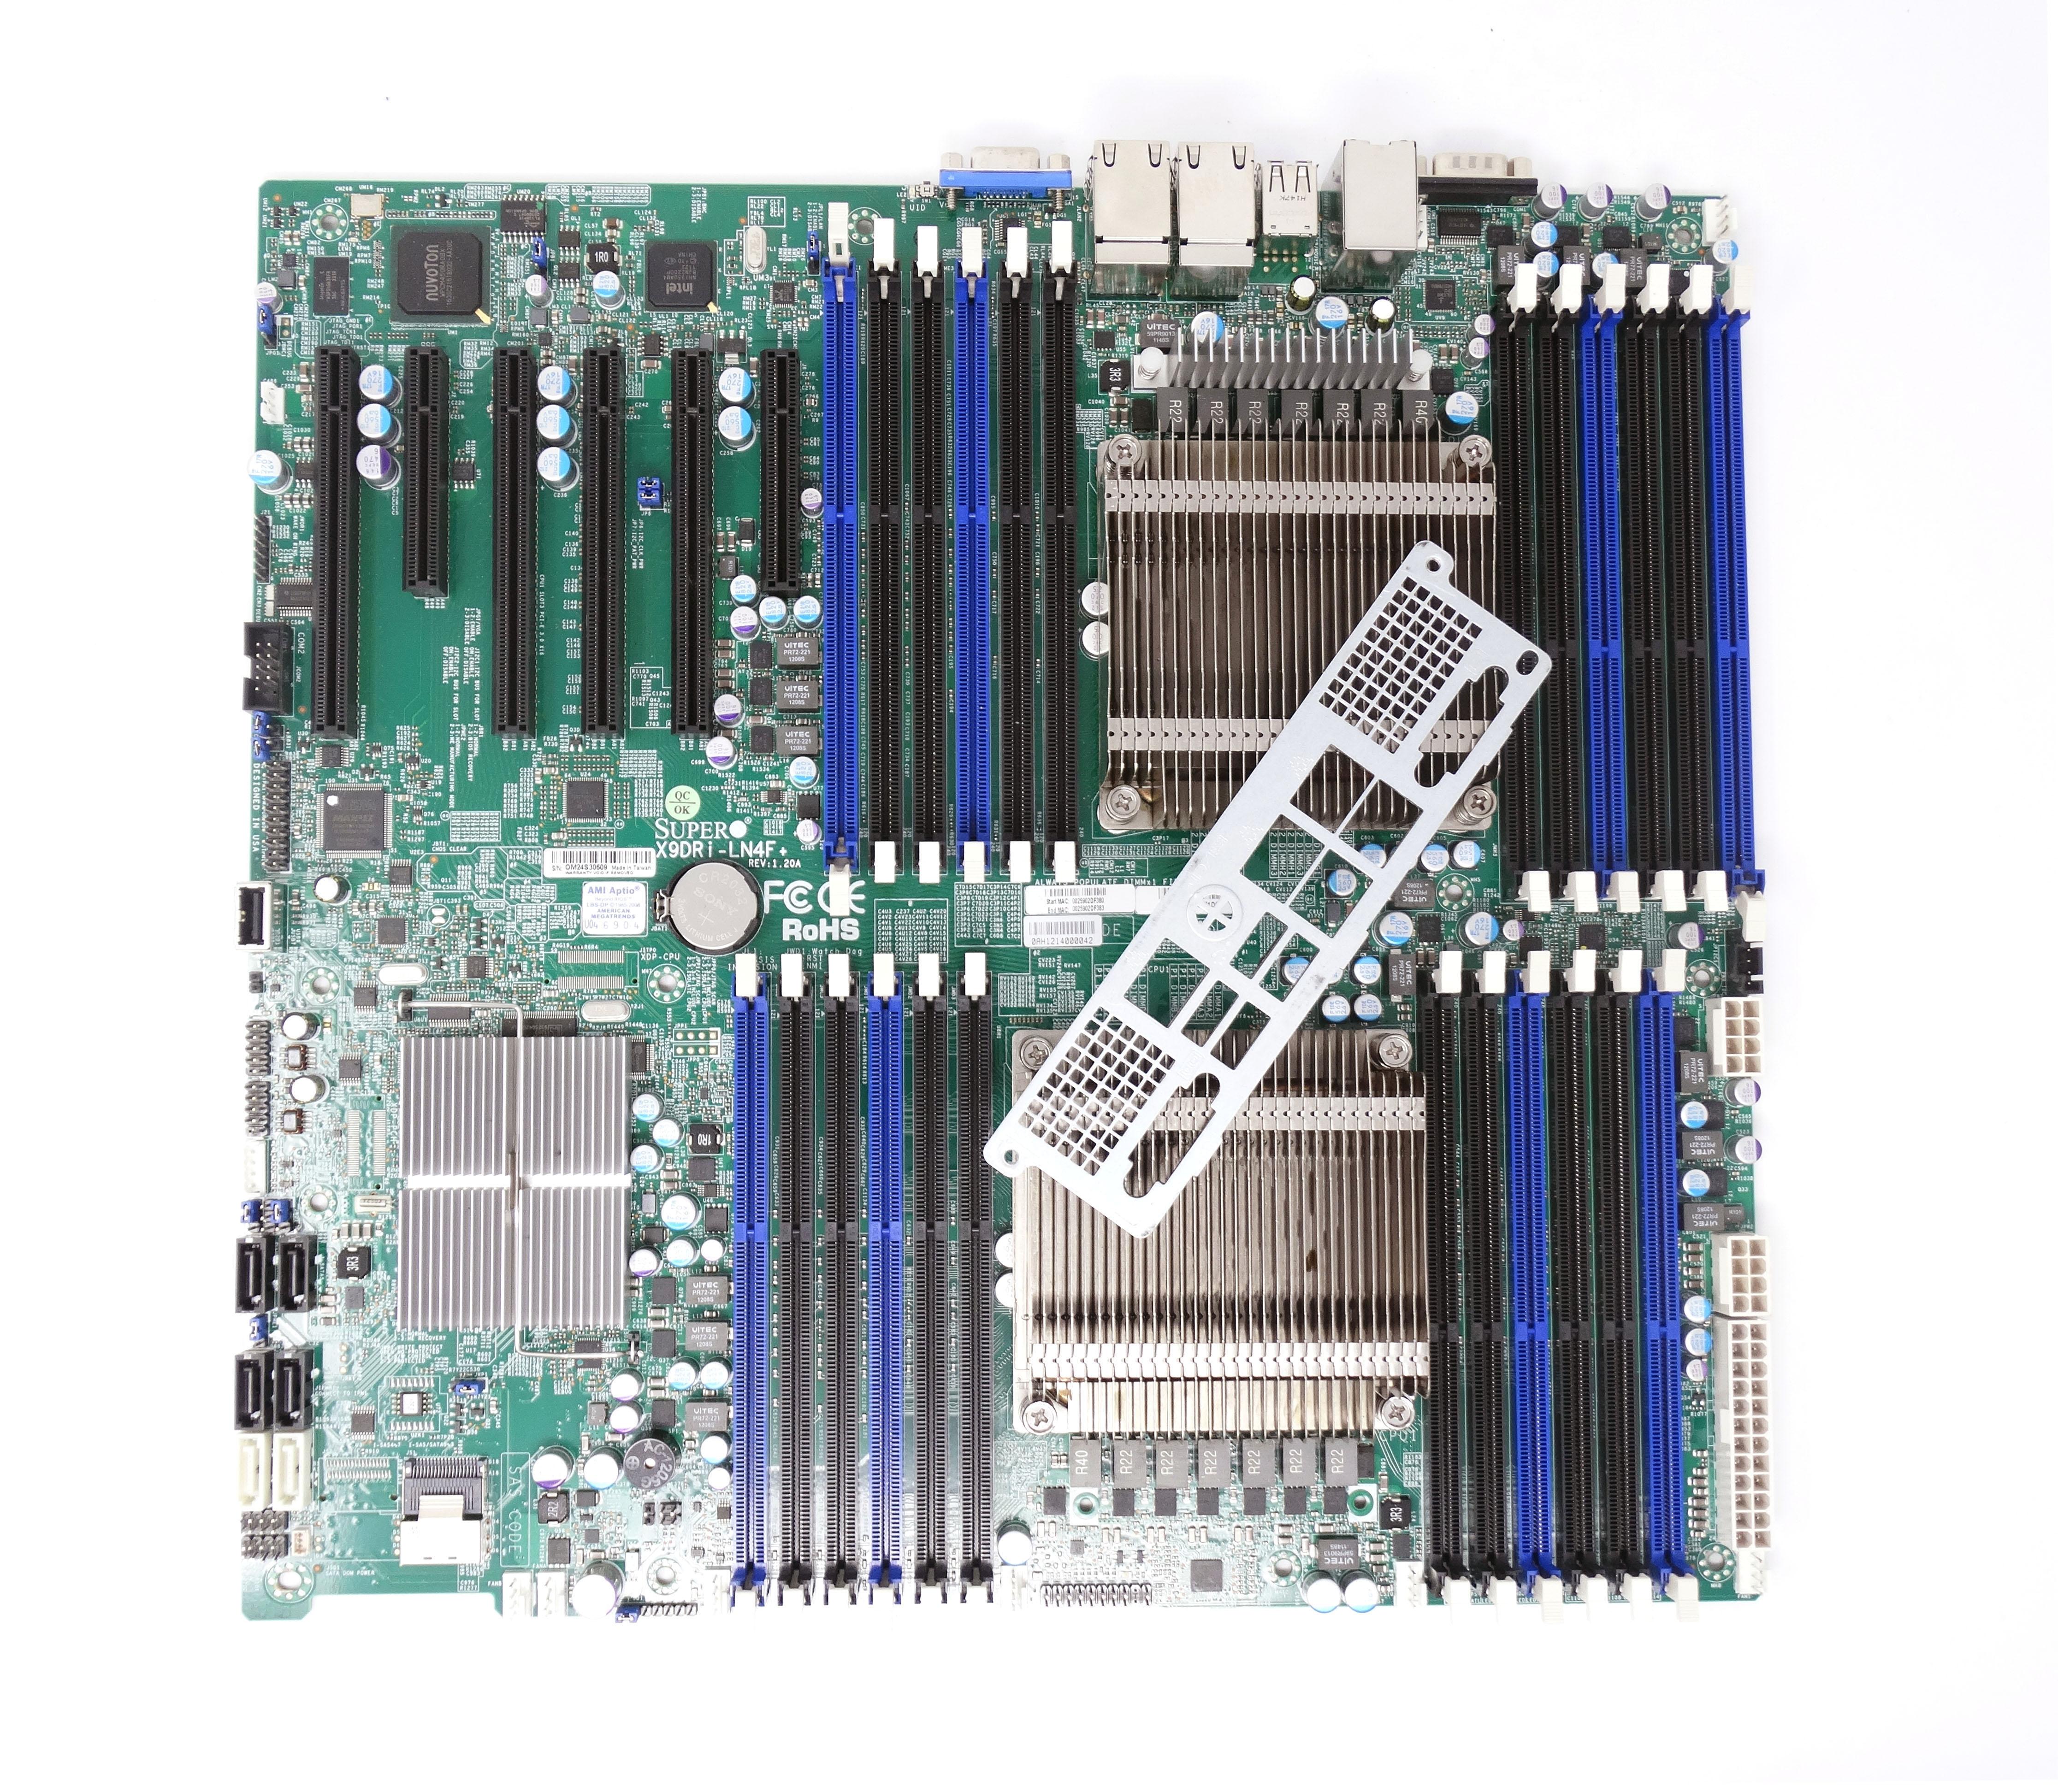 Supermicro Dual Intel Socket LGA2011 Rev 1.10 System Board with I/O Plate (X9DRI-LN4F)